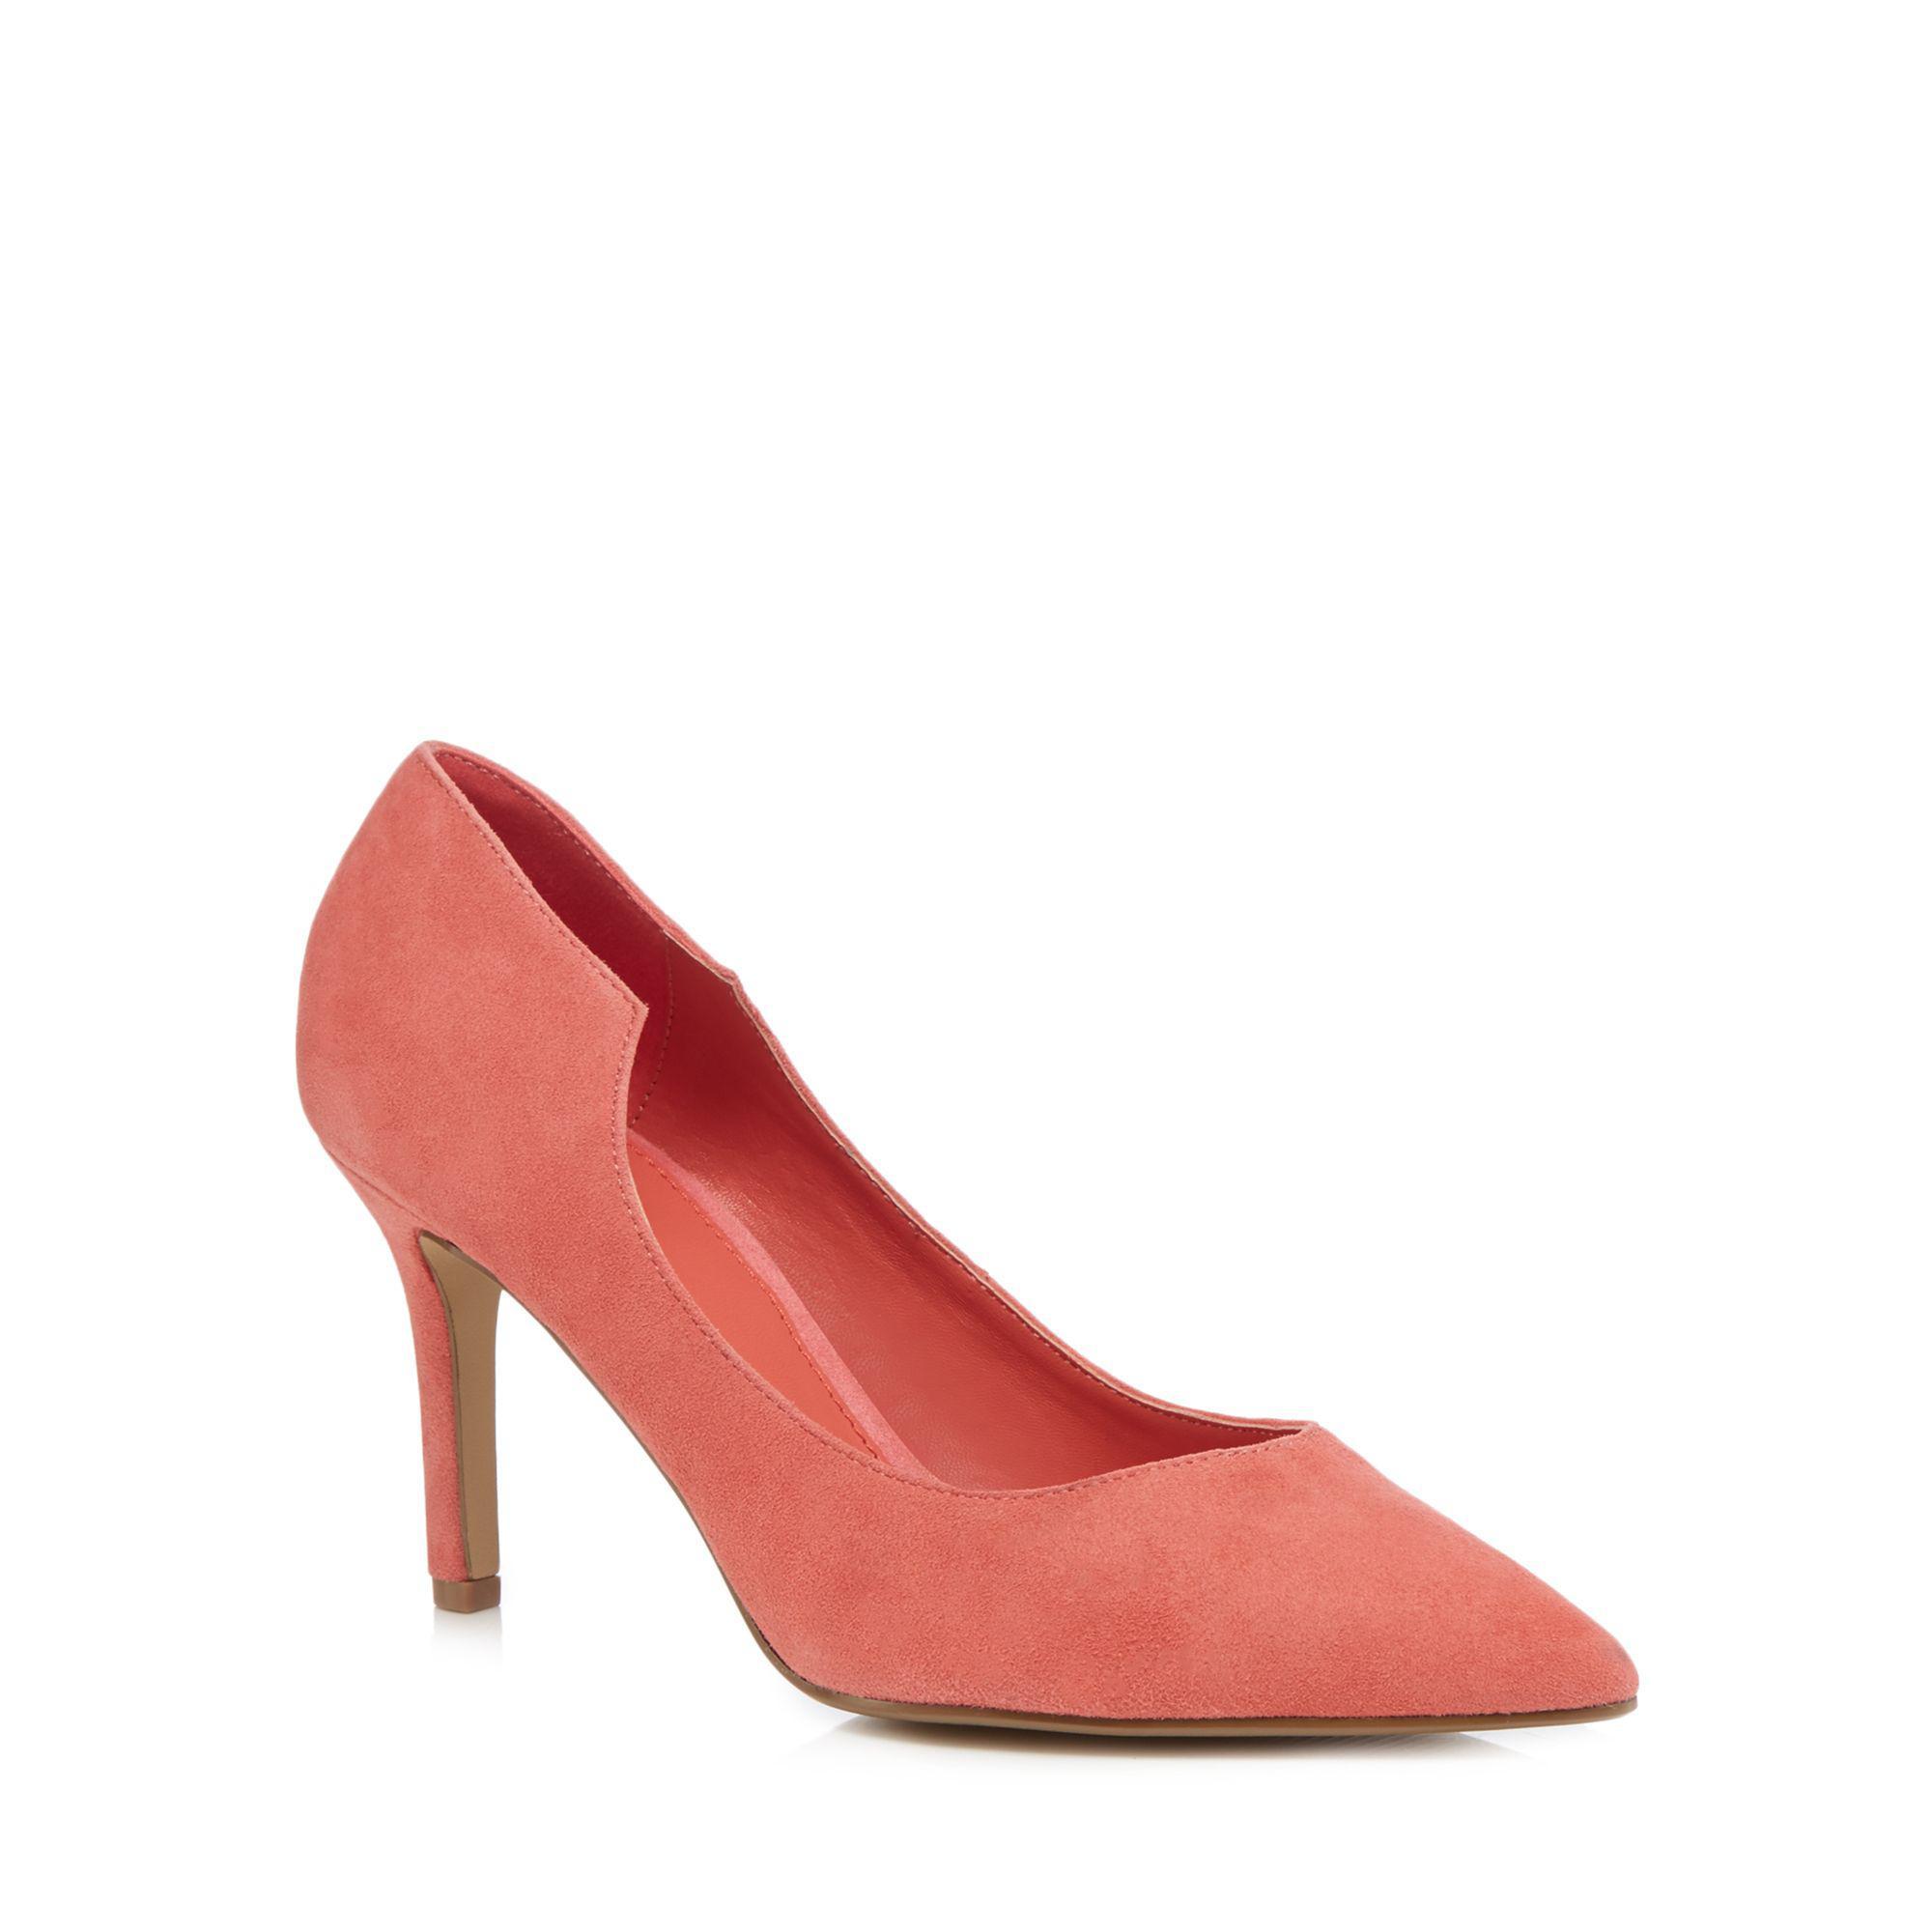 cfa0f27a8cd2 J By Jasper Conran. Women's Pink Suede 'jolie' High Stiletto Heel Pointed  Court Shoes